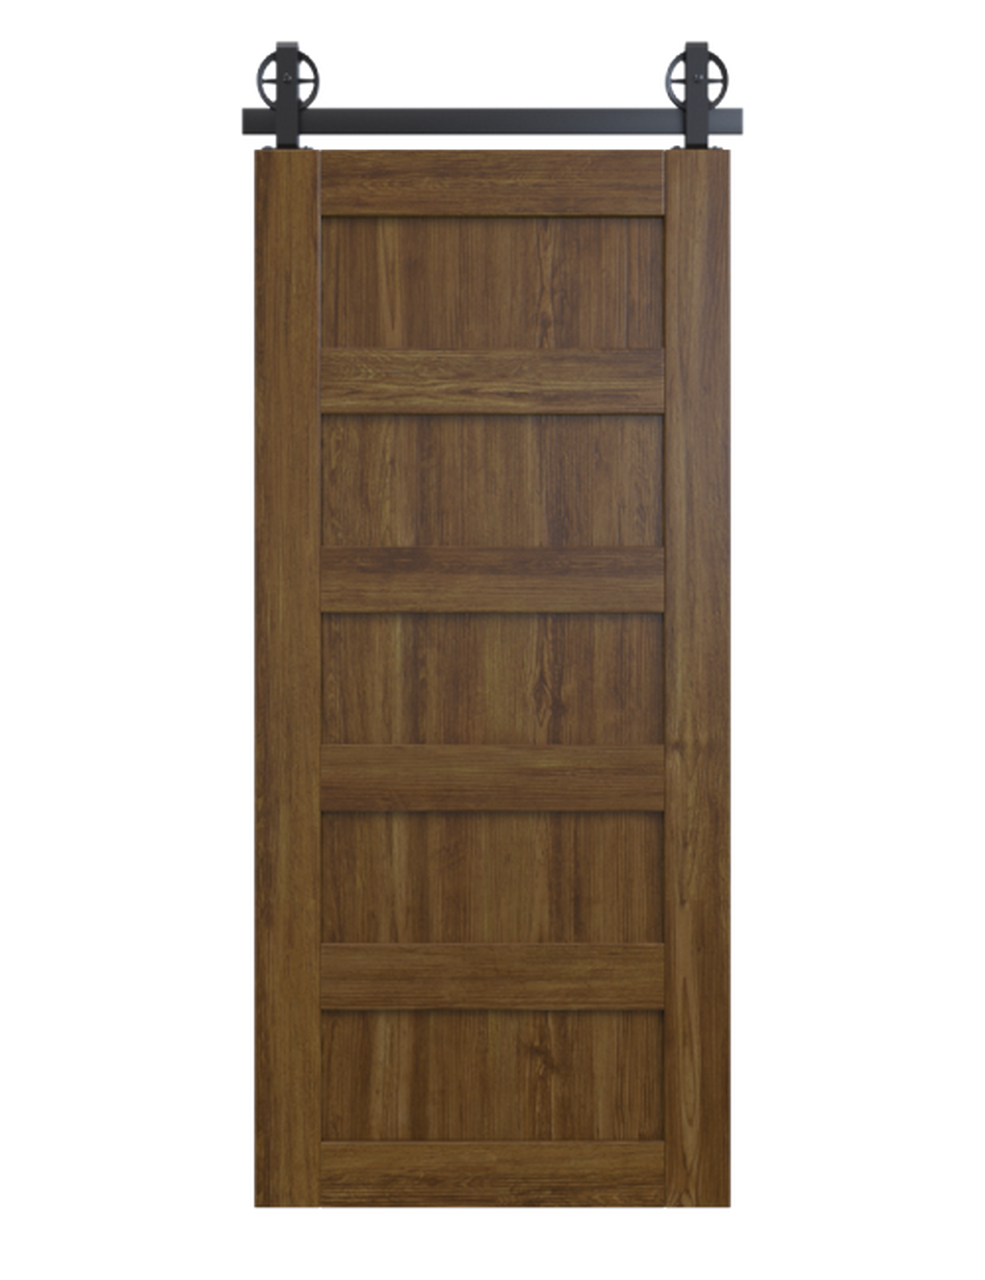 stained wood 5 panel barn door